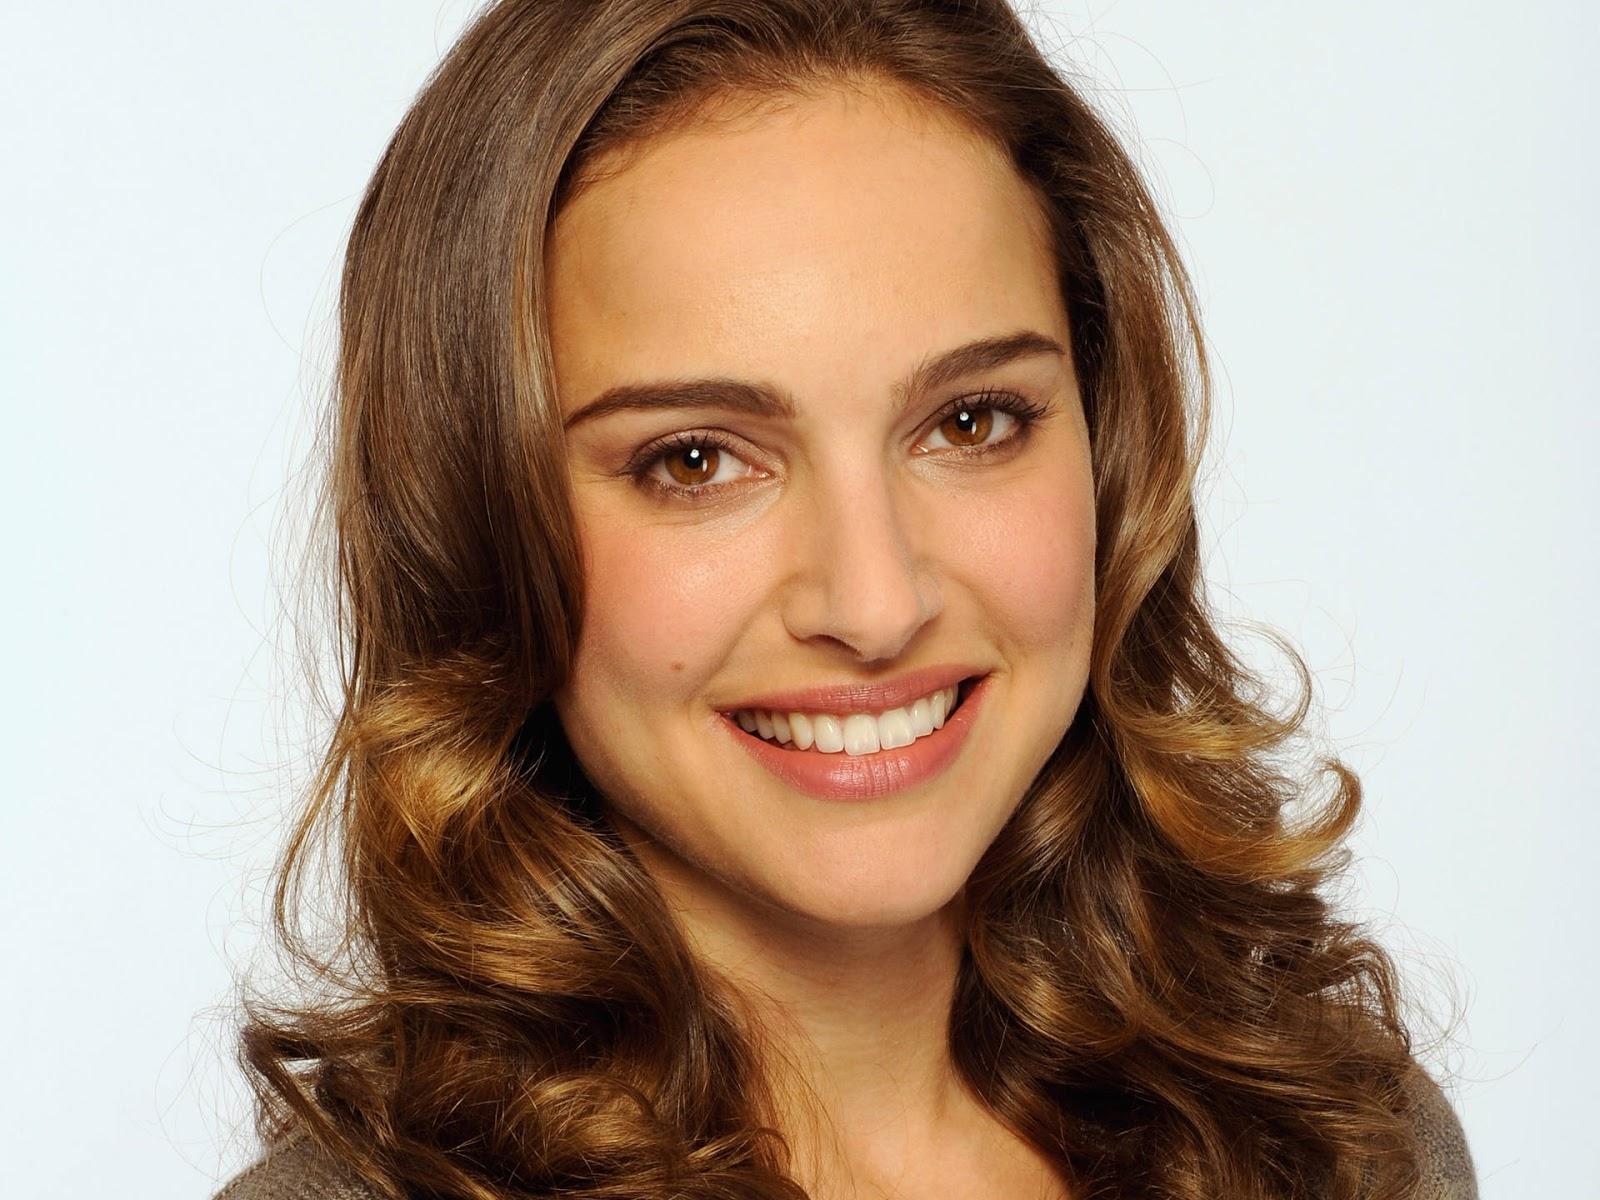 Natalie Portman Cute HD Wallpaper